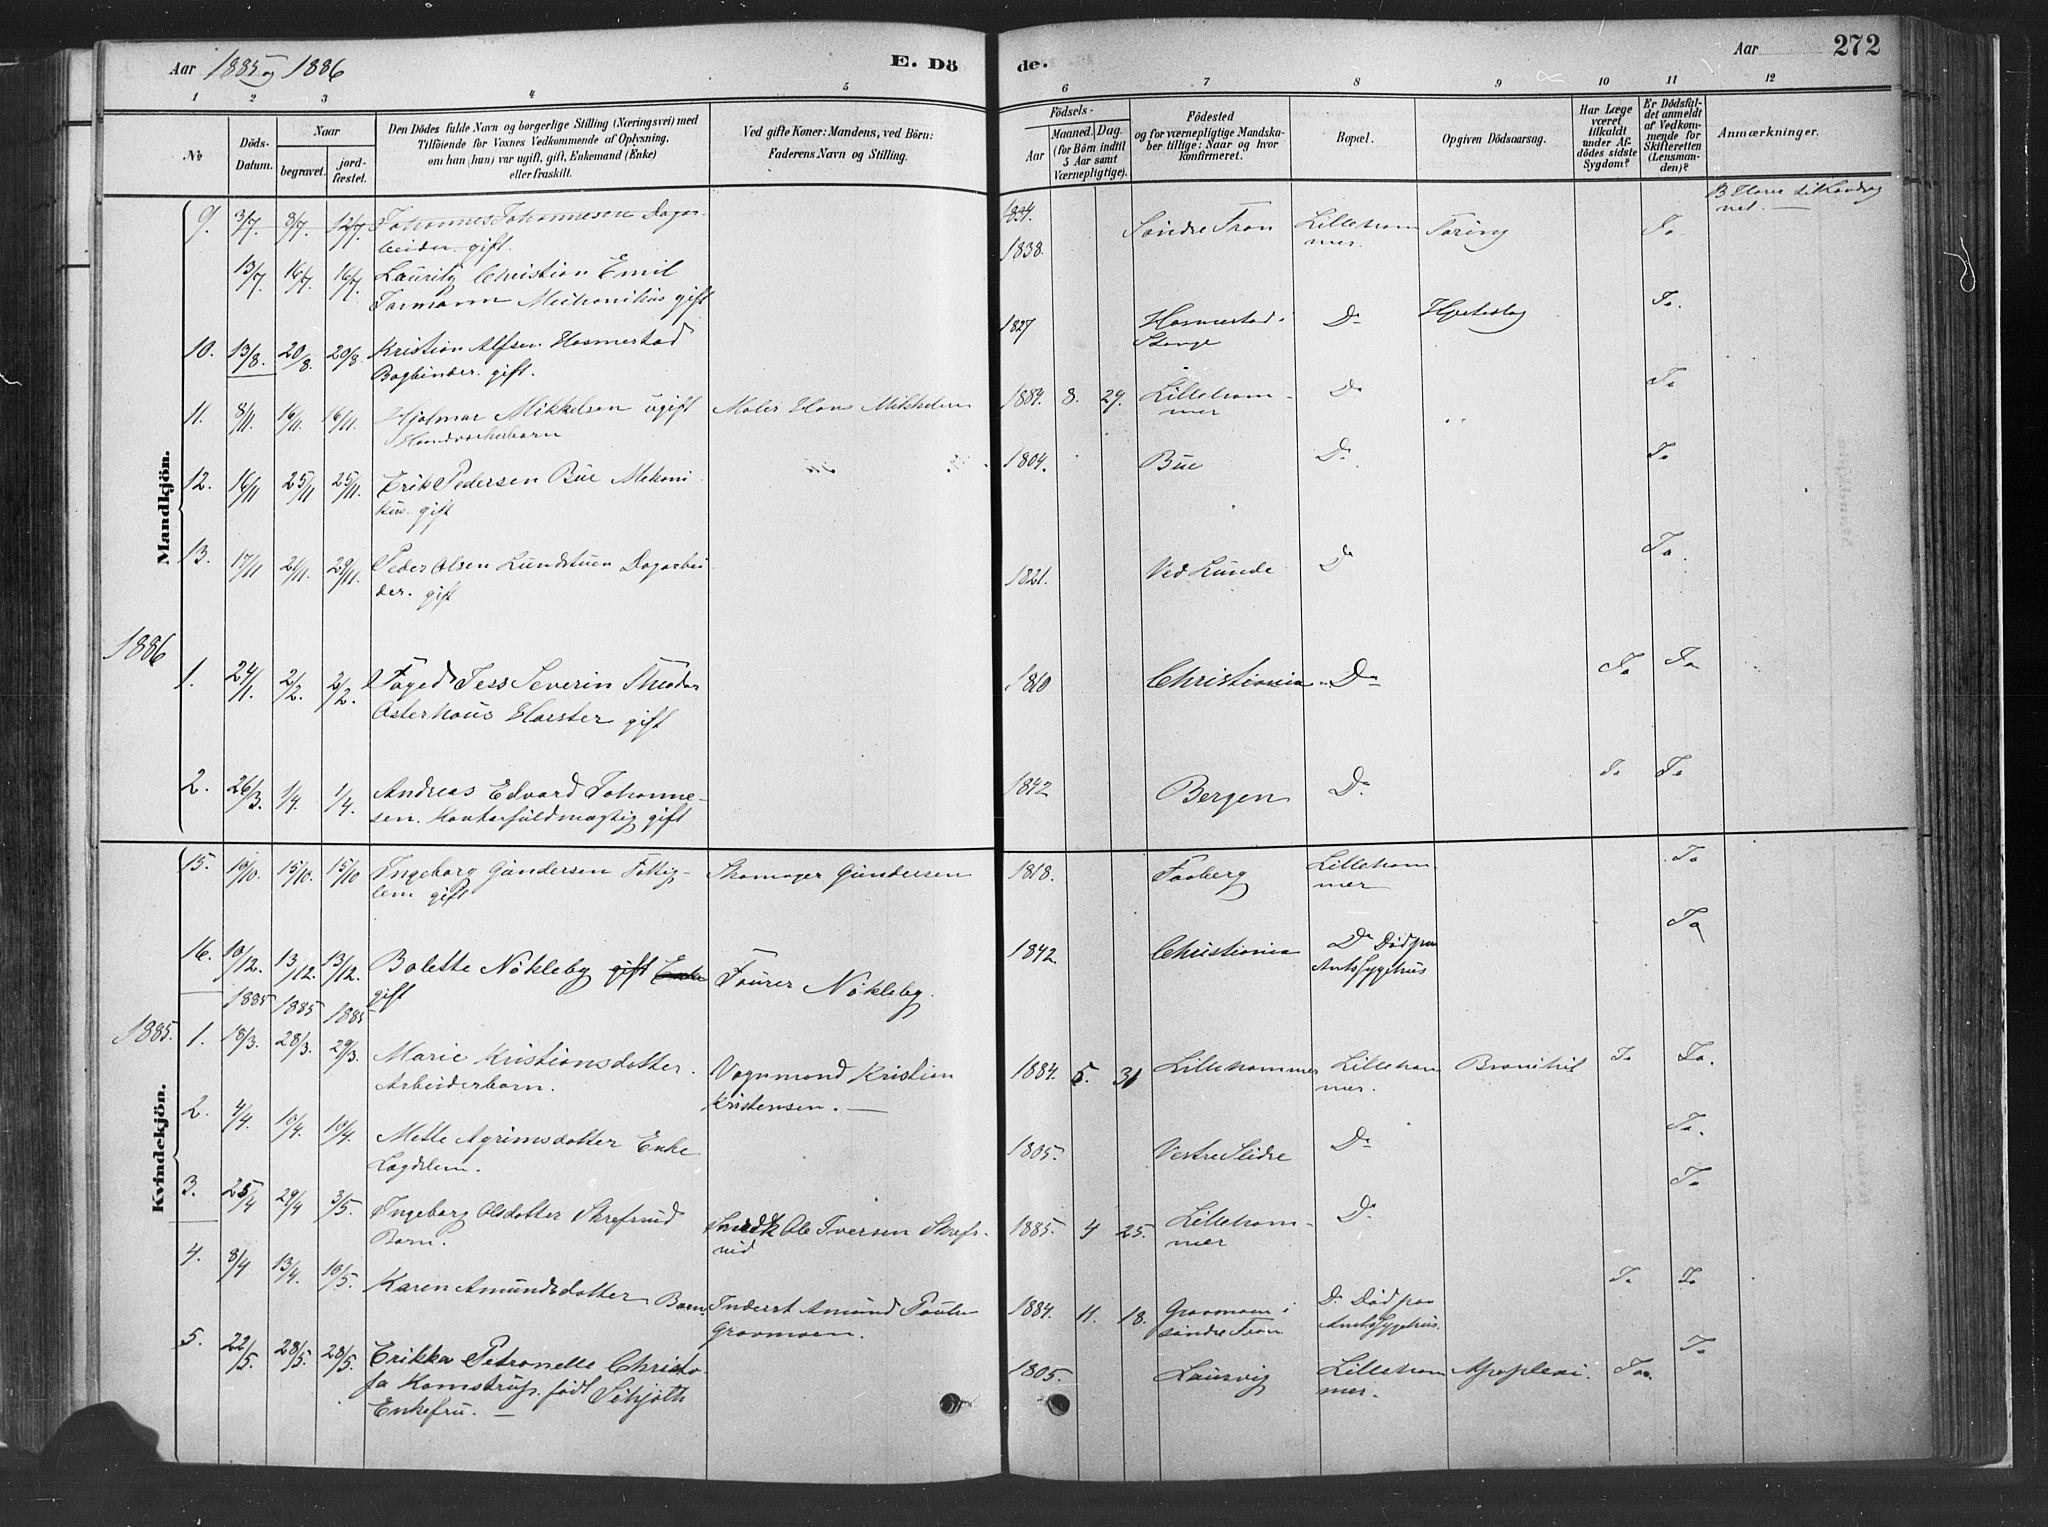 SAH, Fåberg prestekontor, H/Ha/Haa/L0010: Parish register (official) no. 10, 1879-1900, p. 272